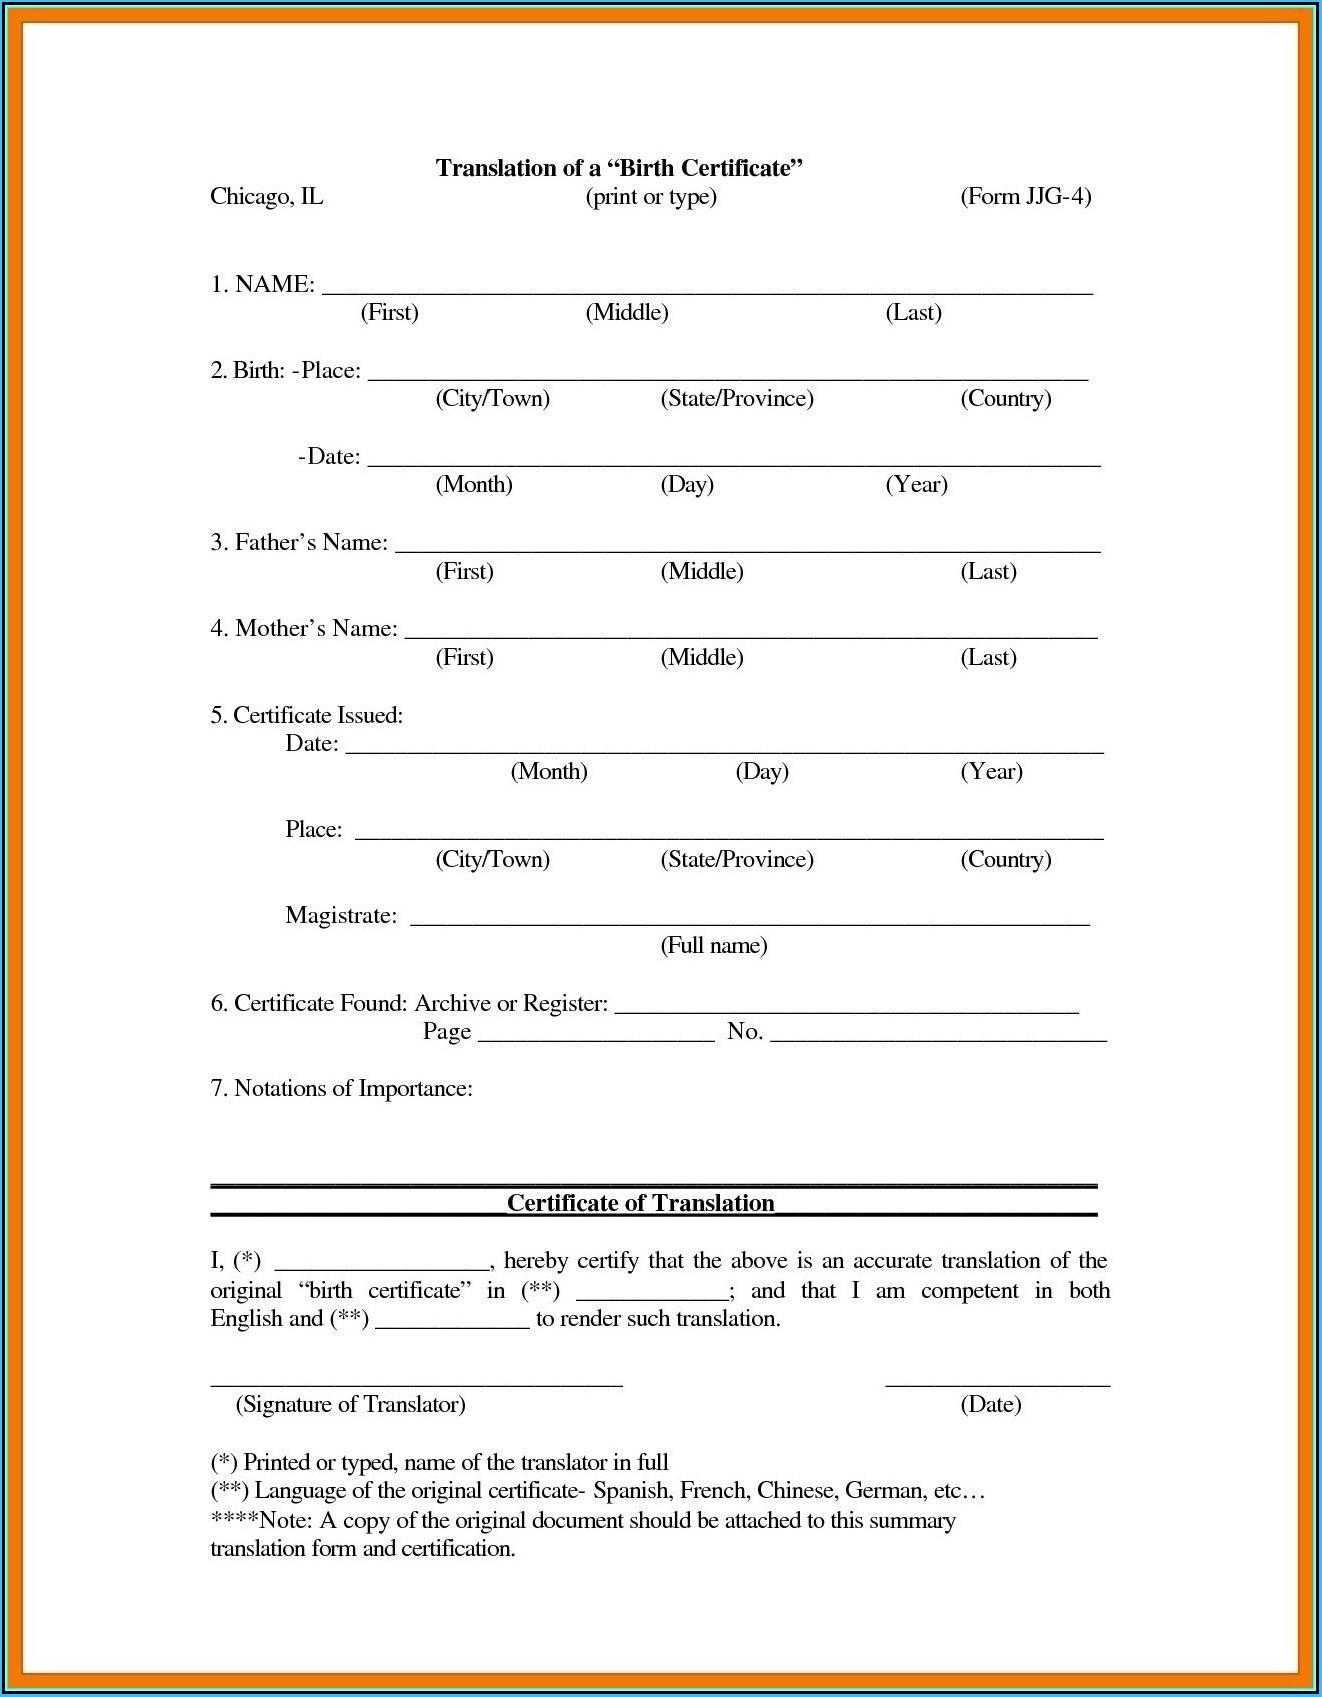 Uscis Birth Certificate Translation Template #10036 For Birth Certificate Translation Template Uscis